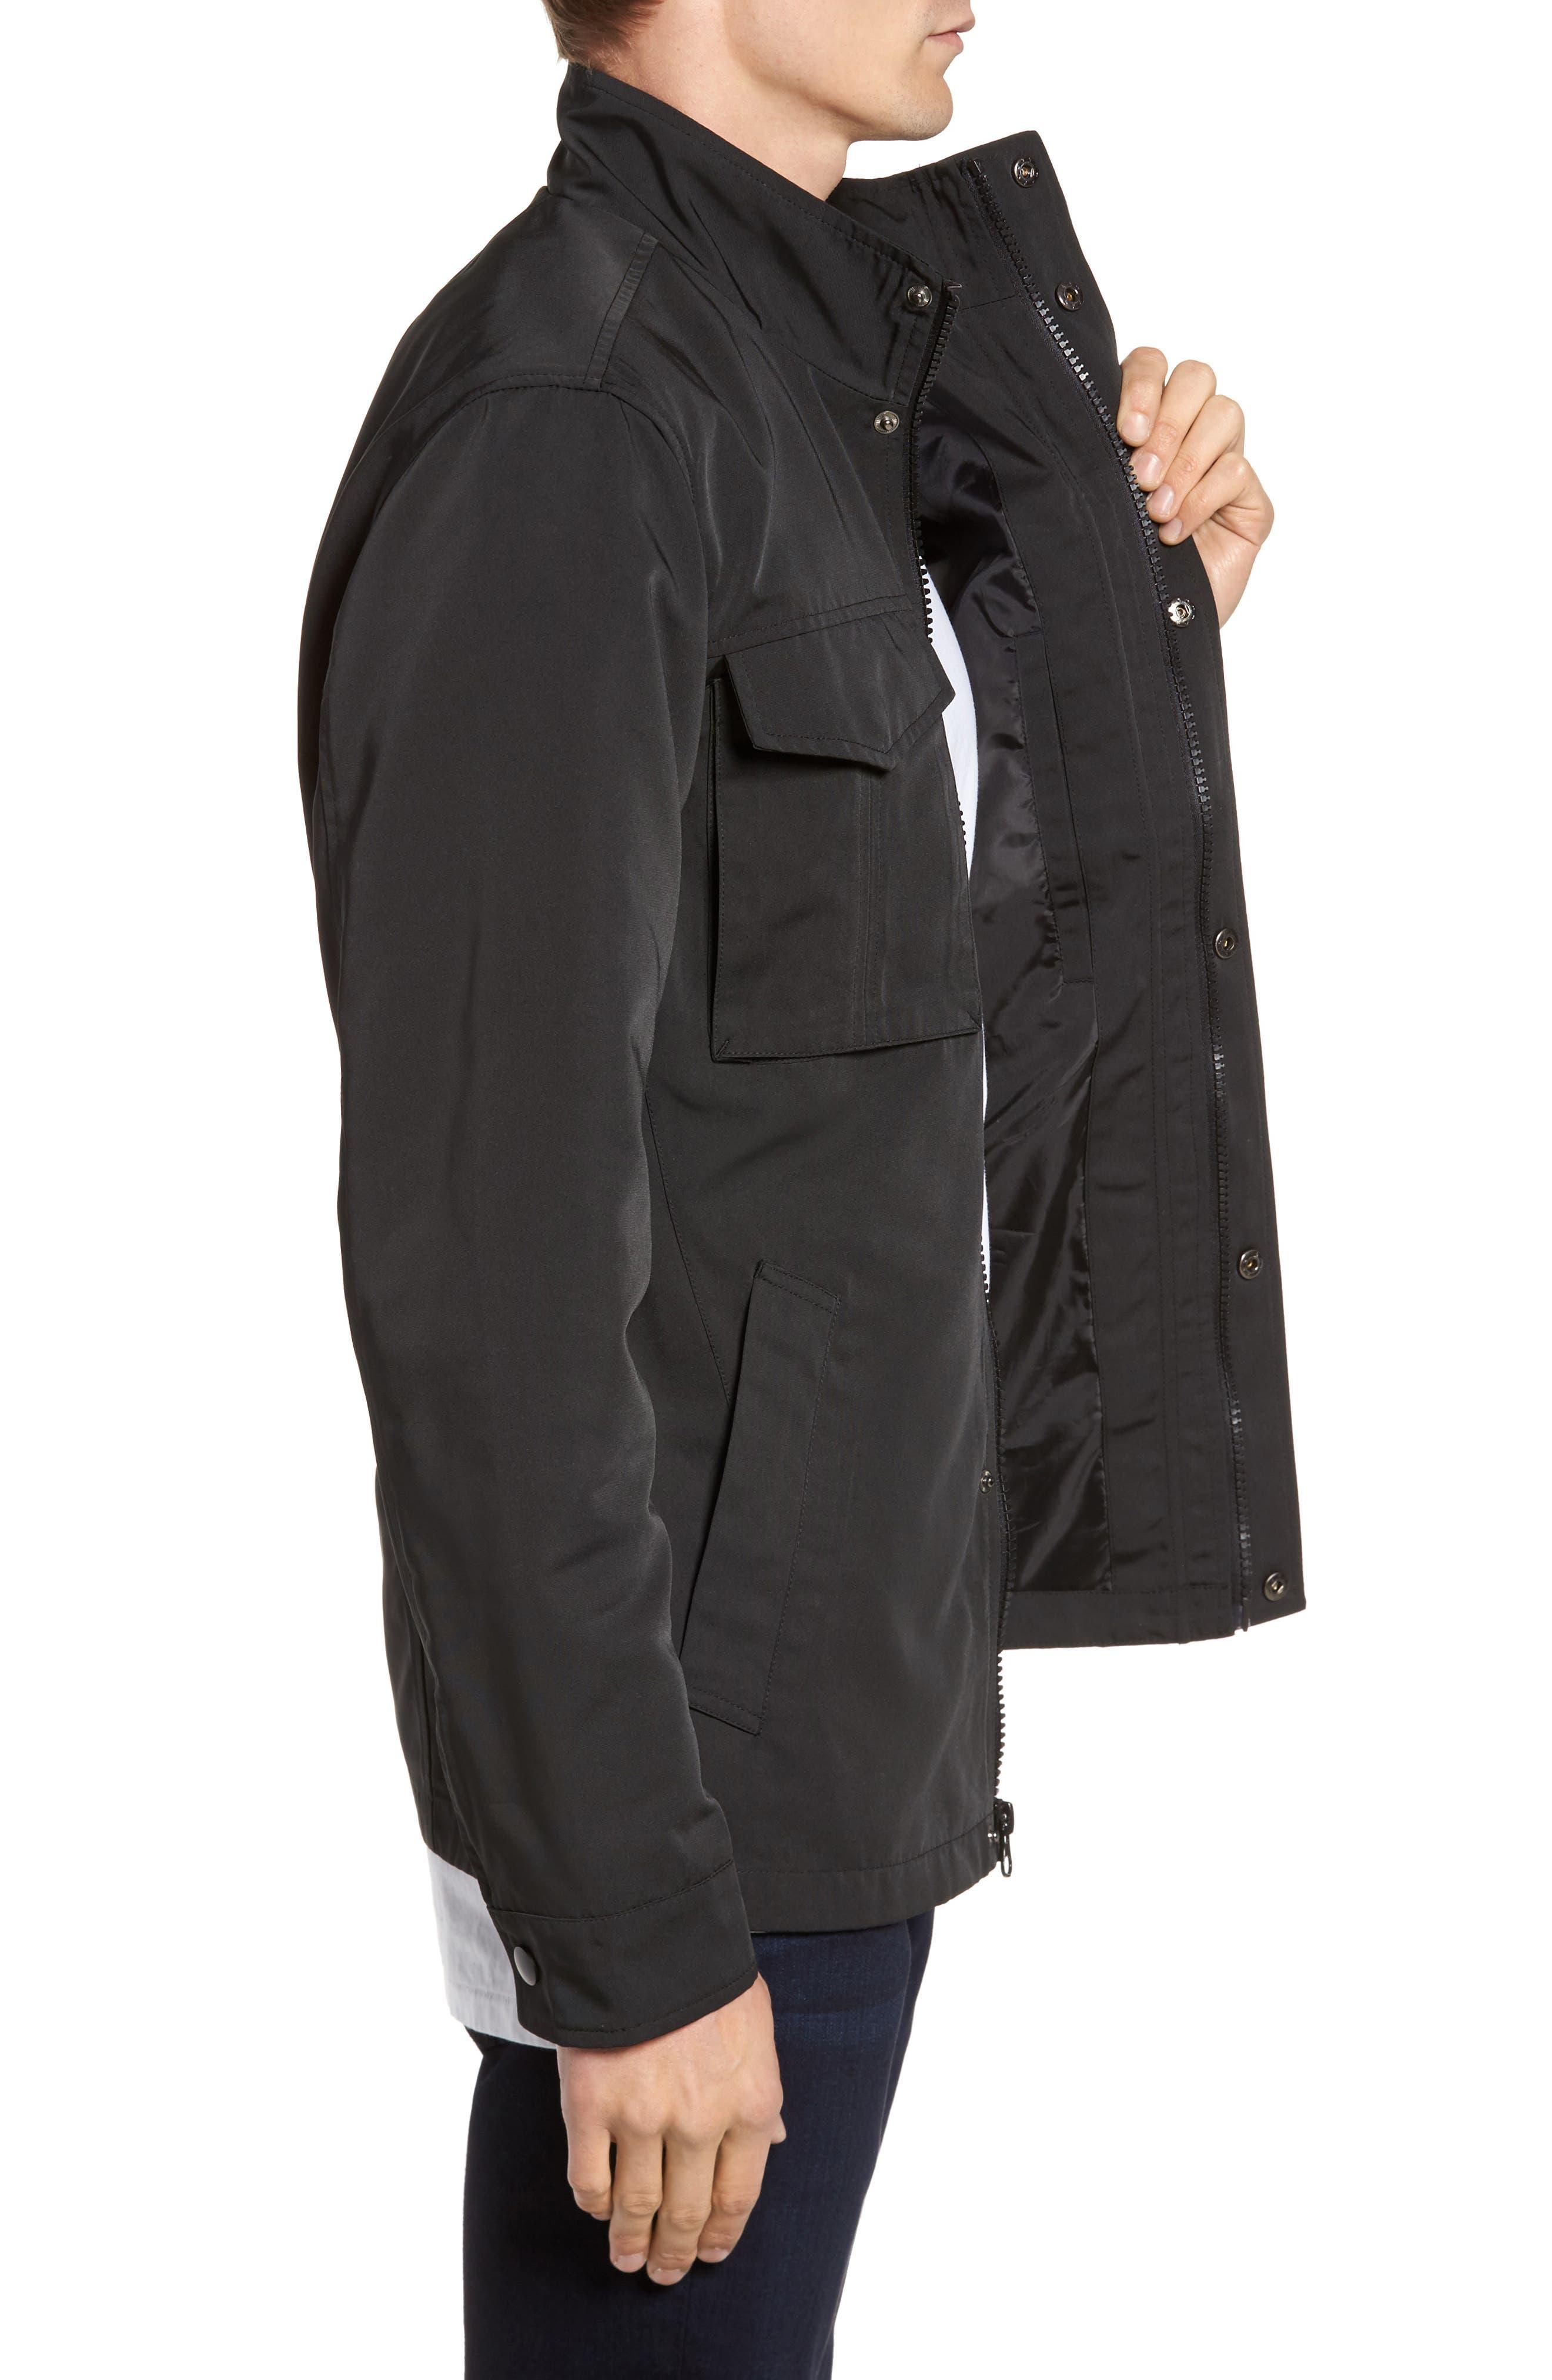 Dougie Waterproof Jacket,                             Alternate thumbnail 5, color,